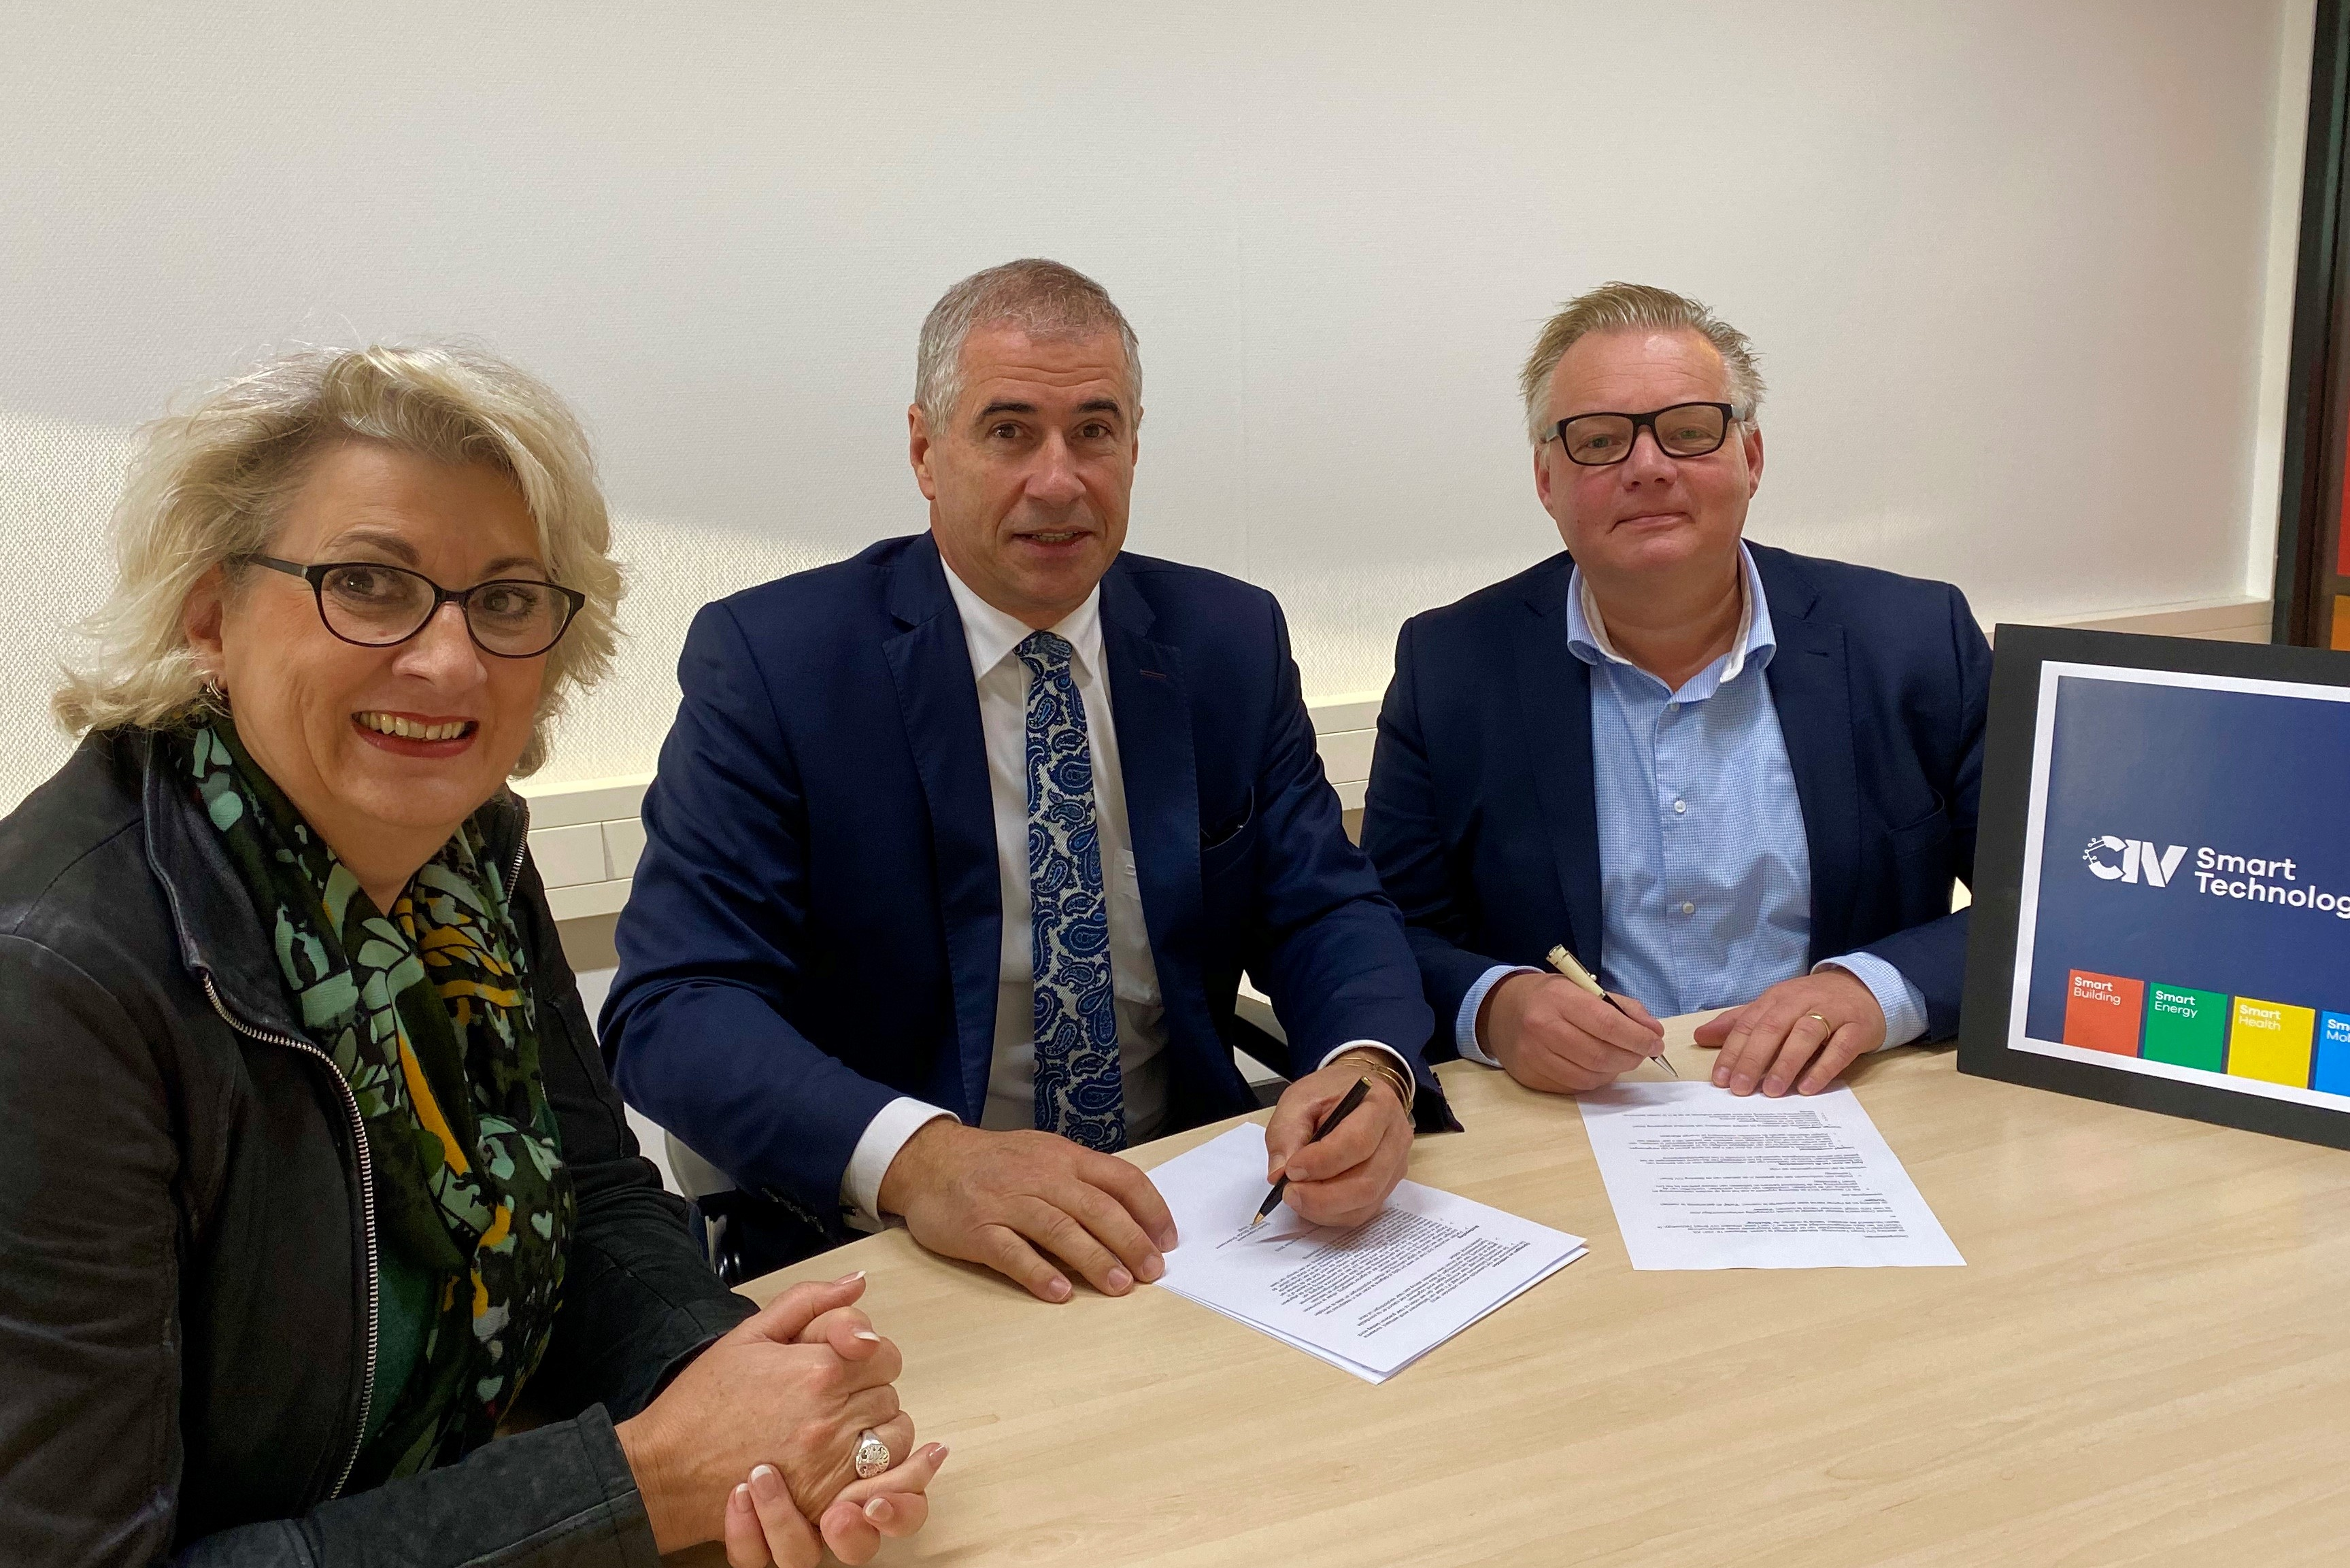 Gouda Onderneemt tekent samenwerkingsovereenkomst CIV Smart Technology